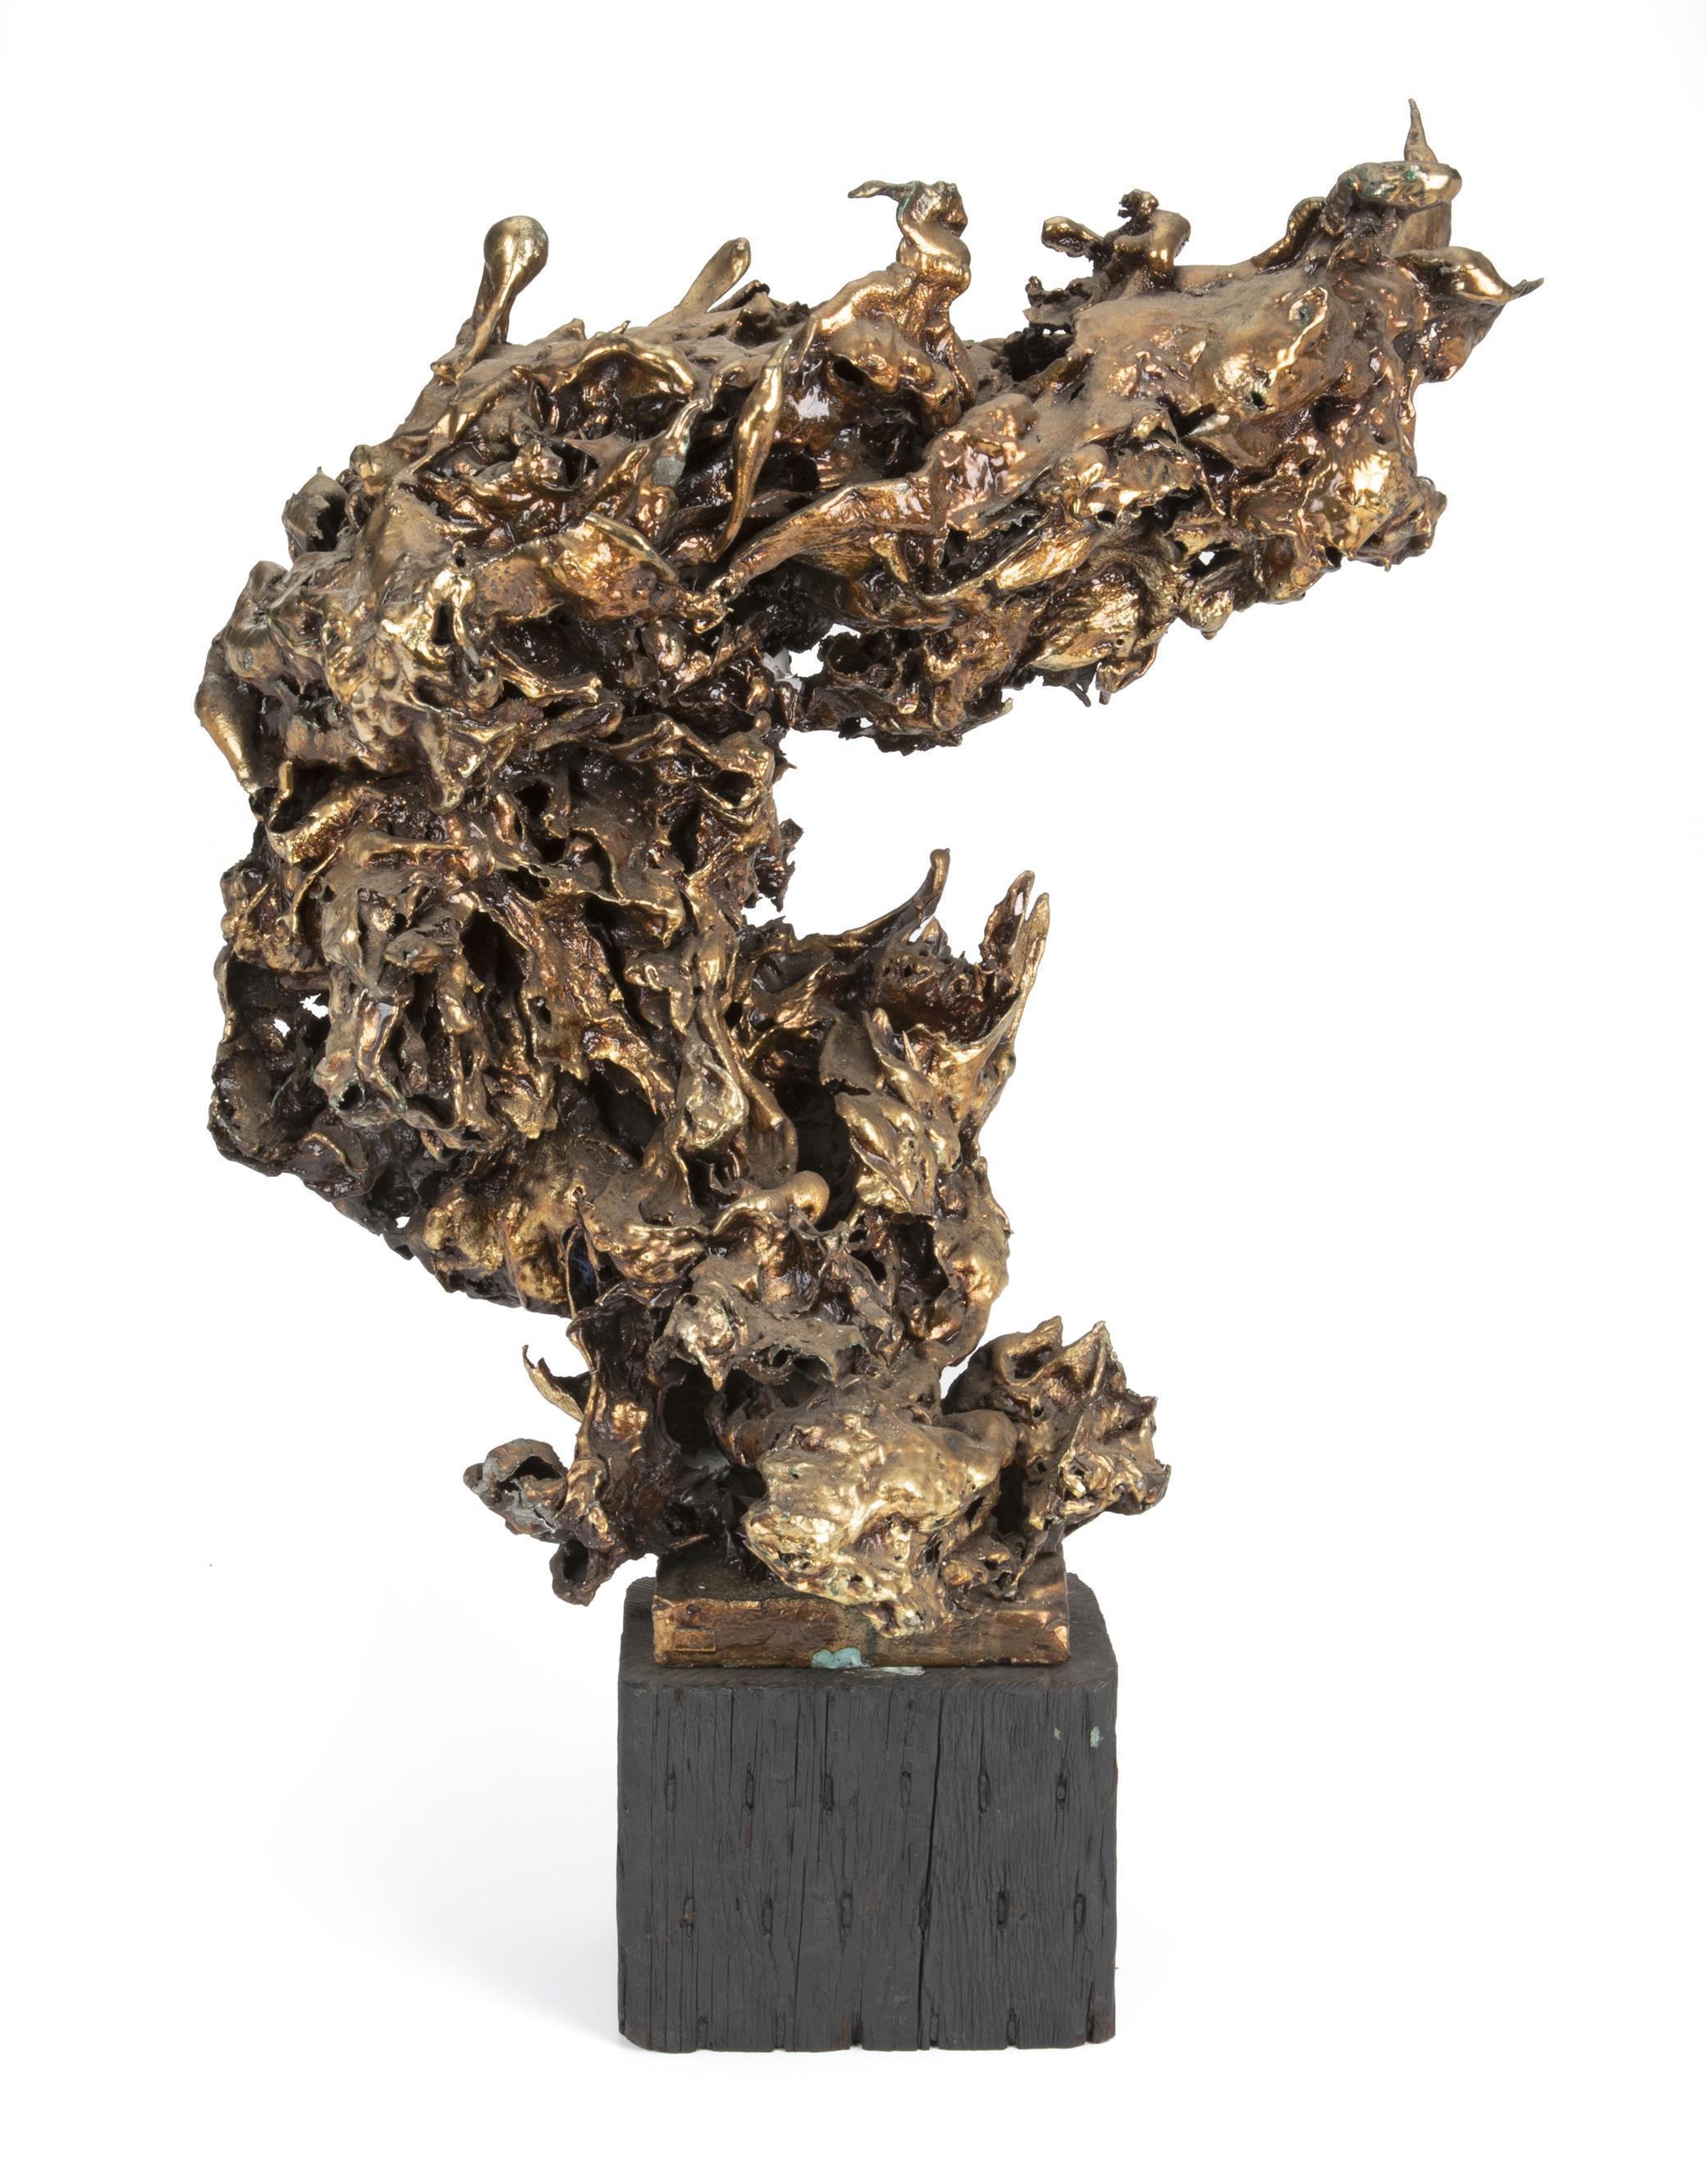 "Sascha Brastoff, (1918-1993, American), Freeform sculpture, Mixed media on wood base, Overall: 30"" H x 20.5"" W x 12"" D; Sculpture: 24"""